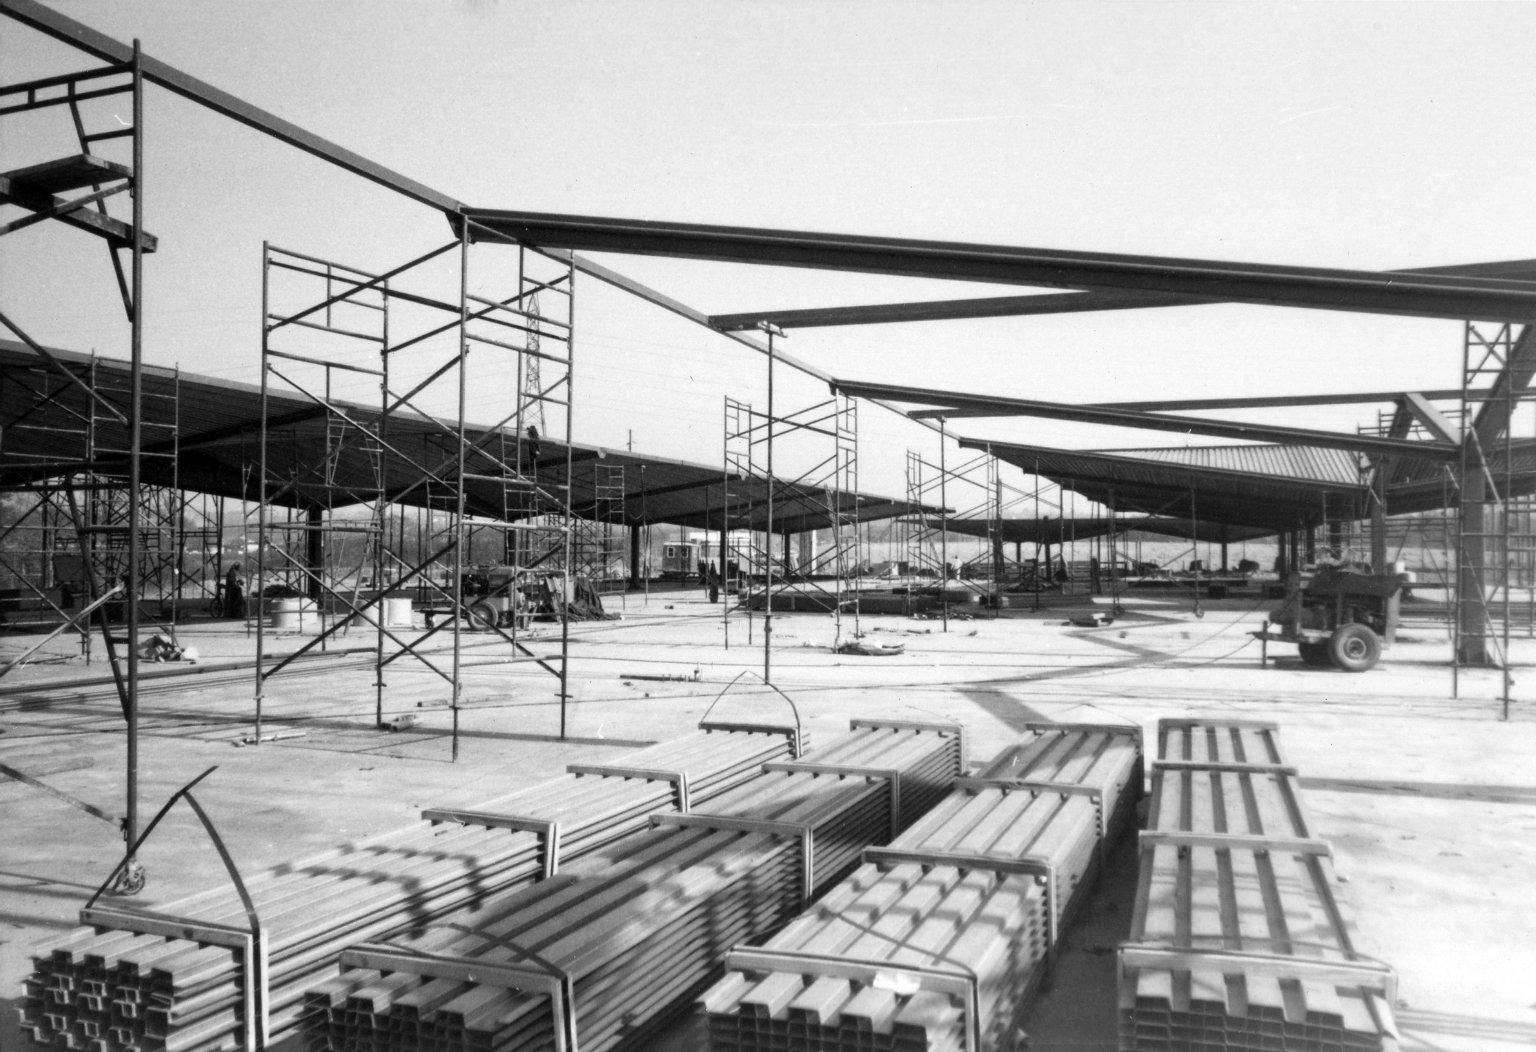 Johnson Hardin Printing Plant